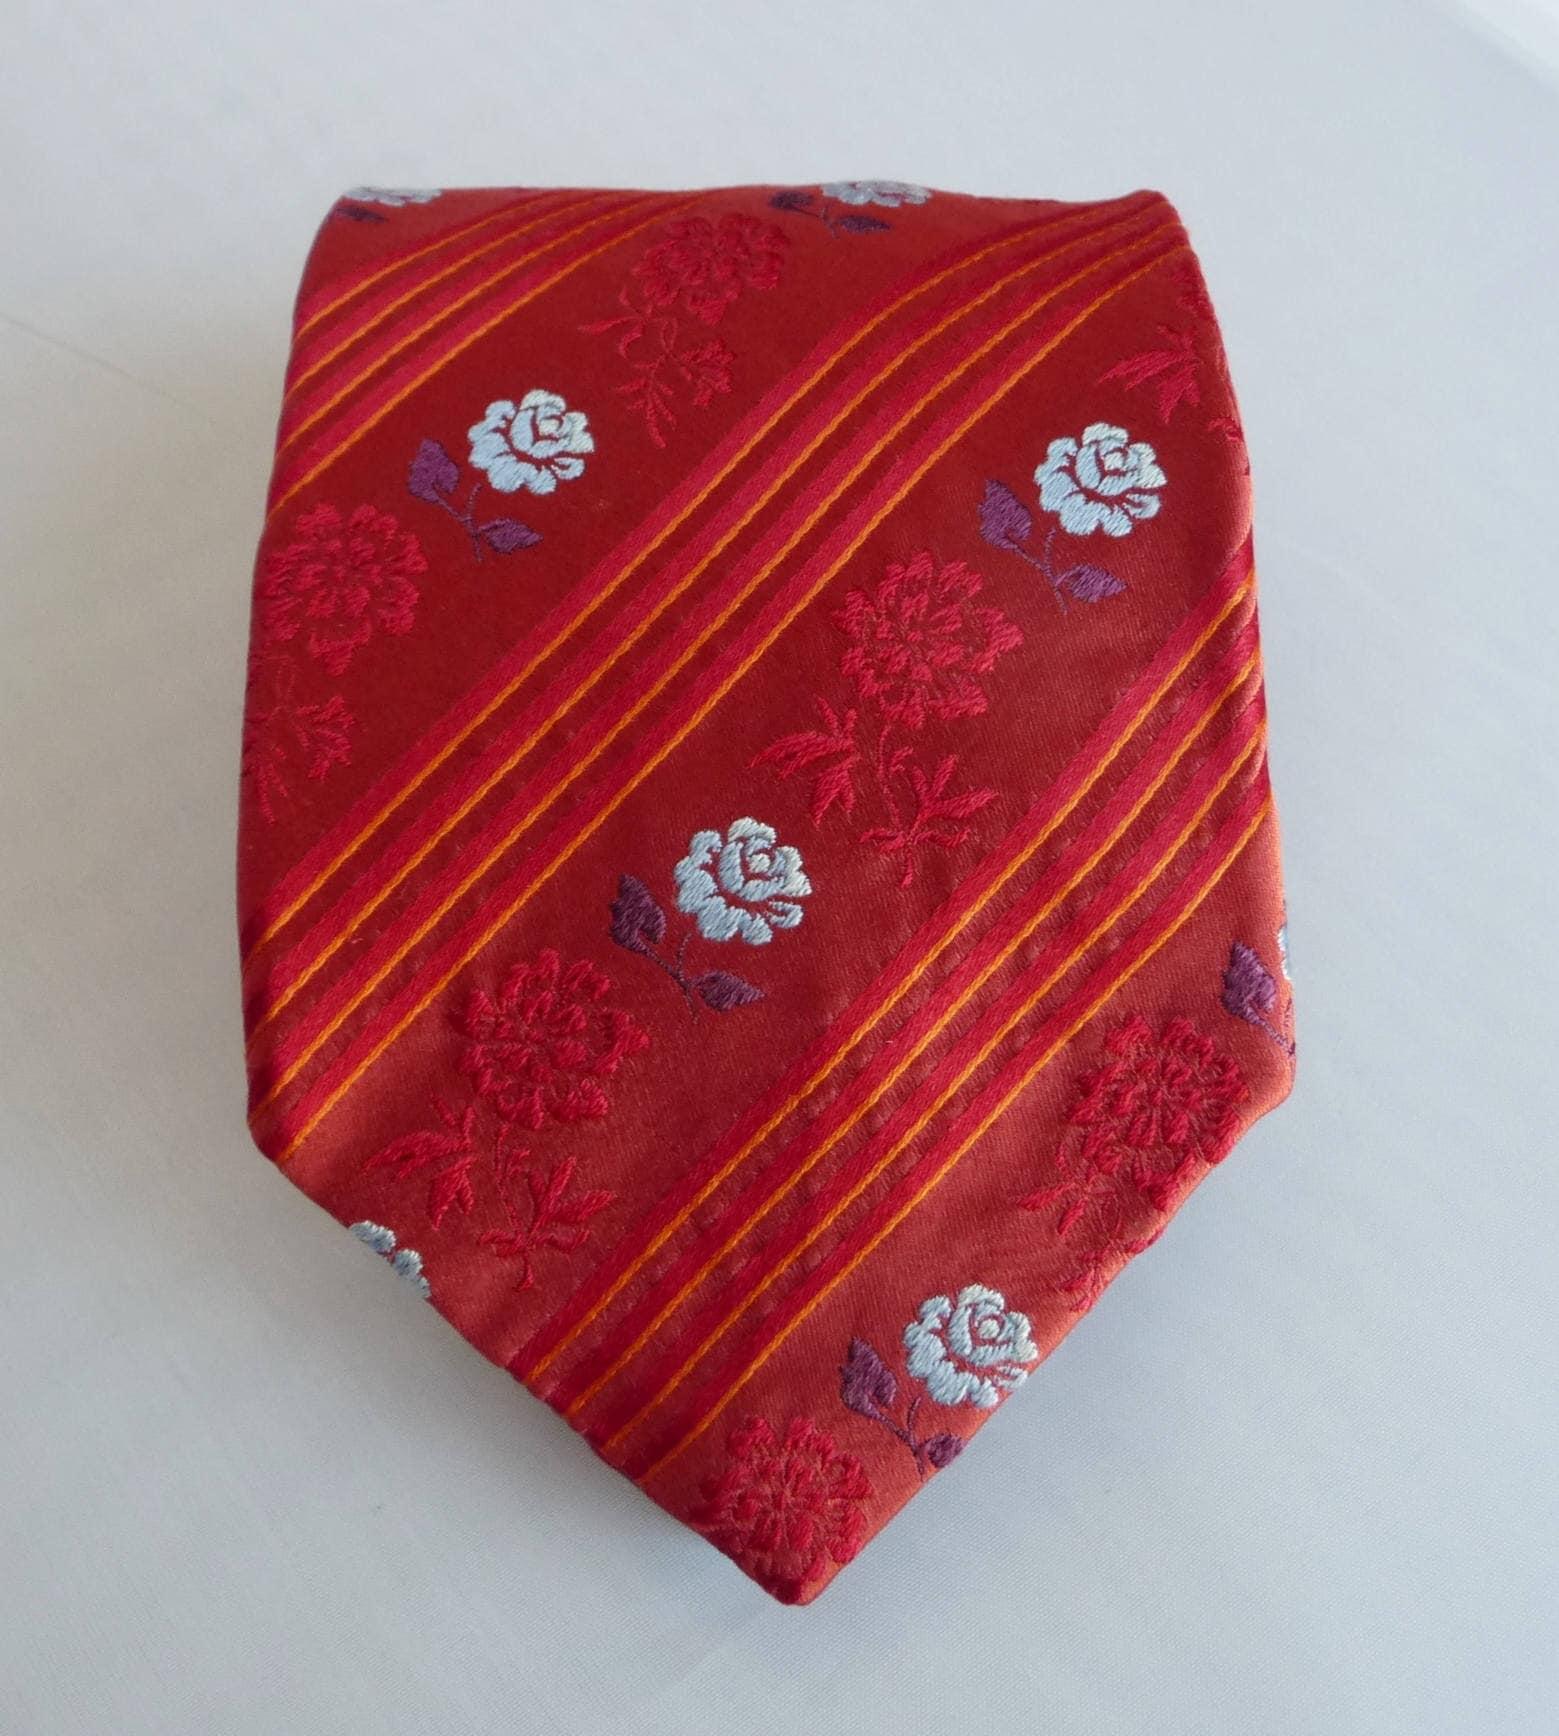 e1dcac7b Ermenegildo Zegna Tie- Mens Silk Tie- Rusty Orange Red- Striped Floral Tie-  Woven Design- Stripes- Blue Flowers- Luxury Brand- Italy- 3 3/4